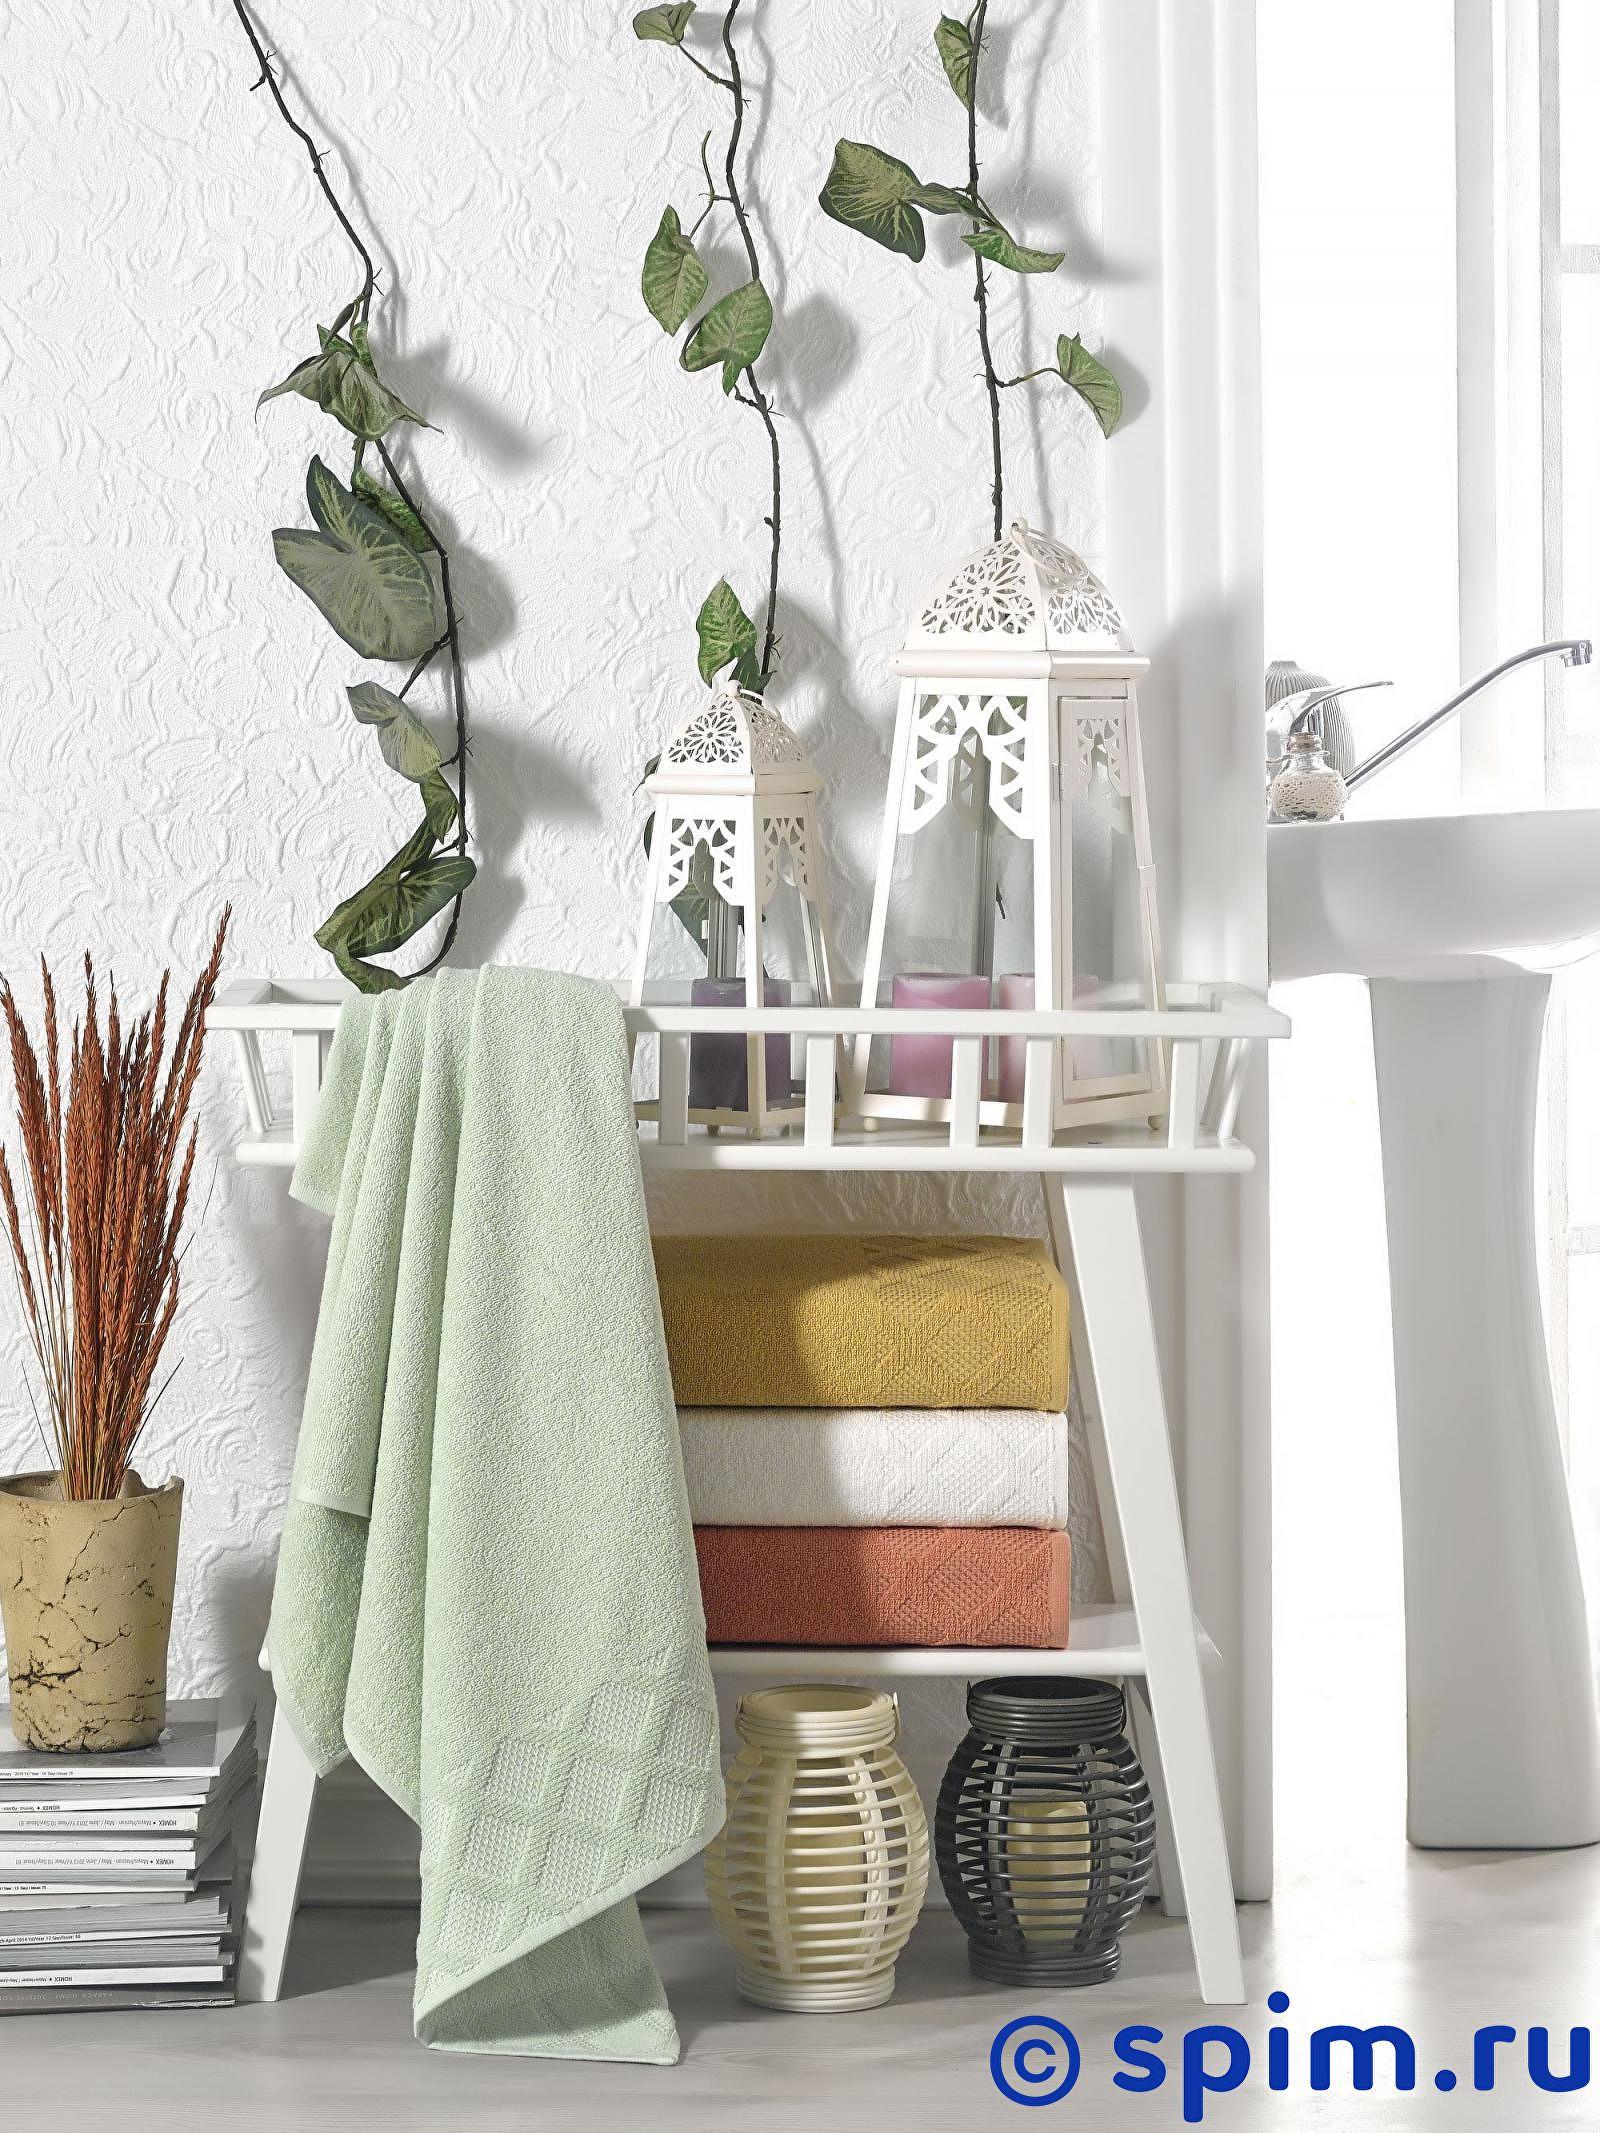 Набор из 4-х полотенец Do&co Sydney 50х90 см полотенца do n co полотенце lady цвет мятный набор